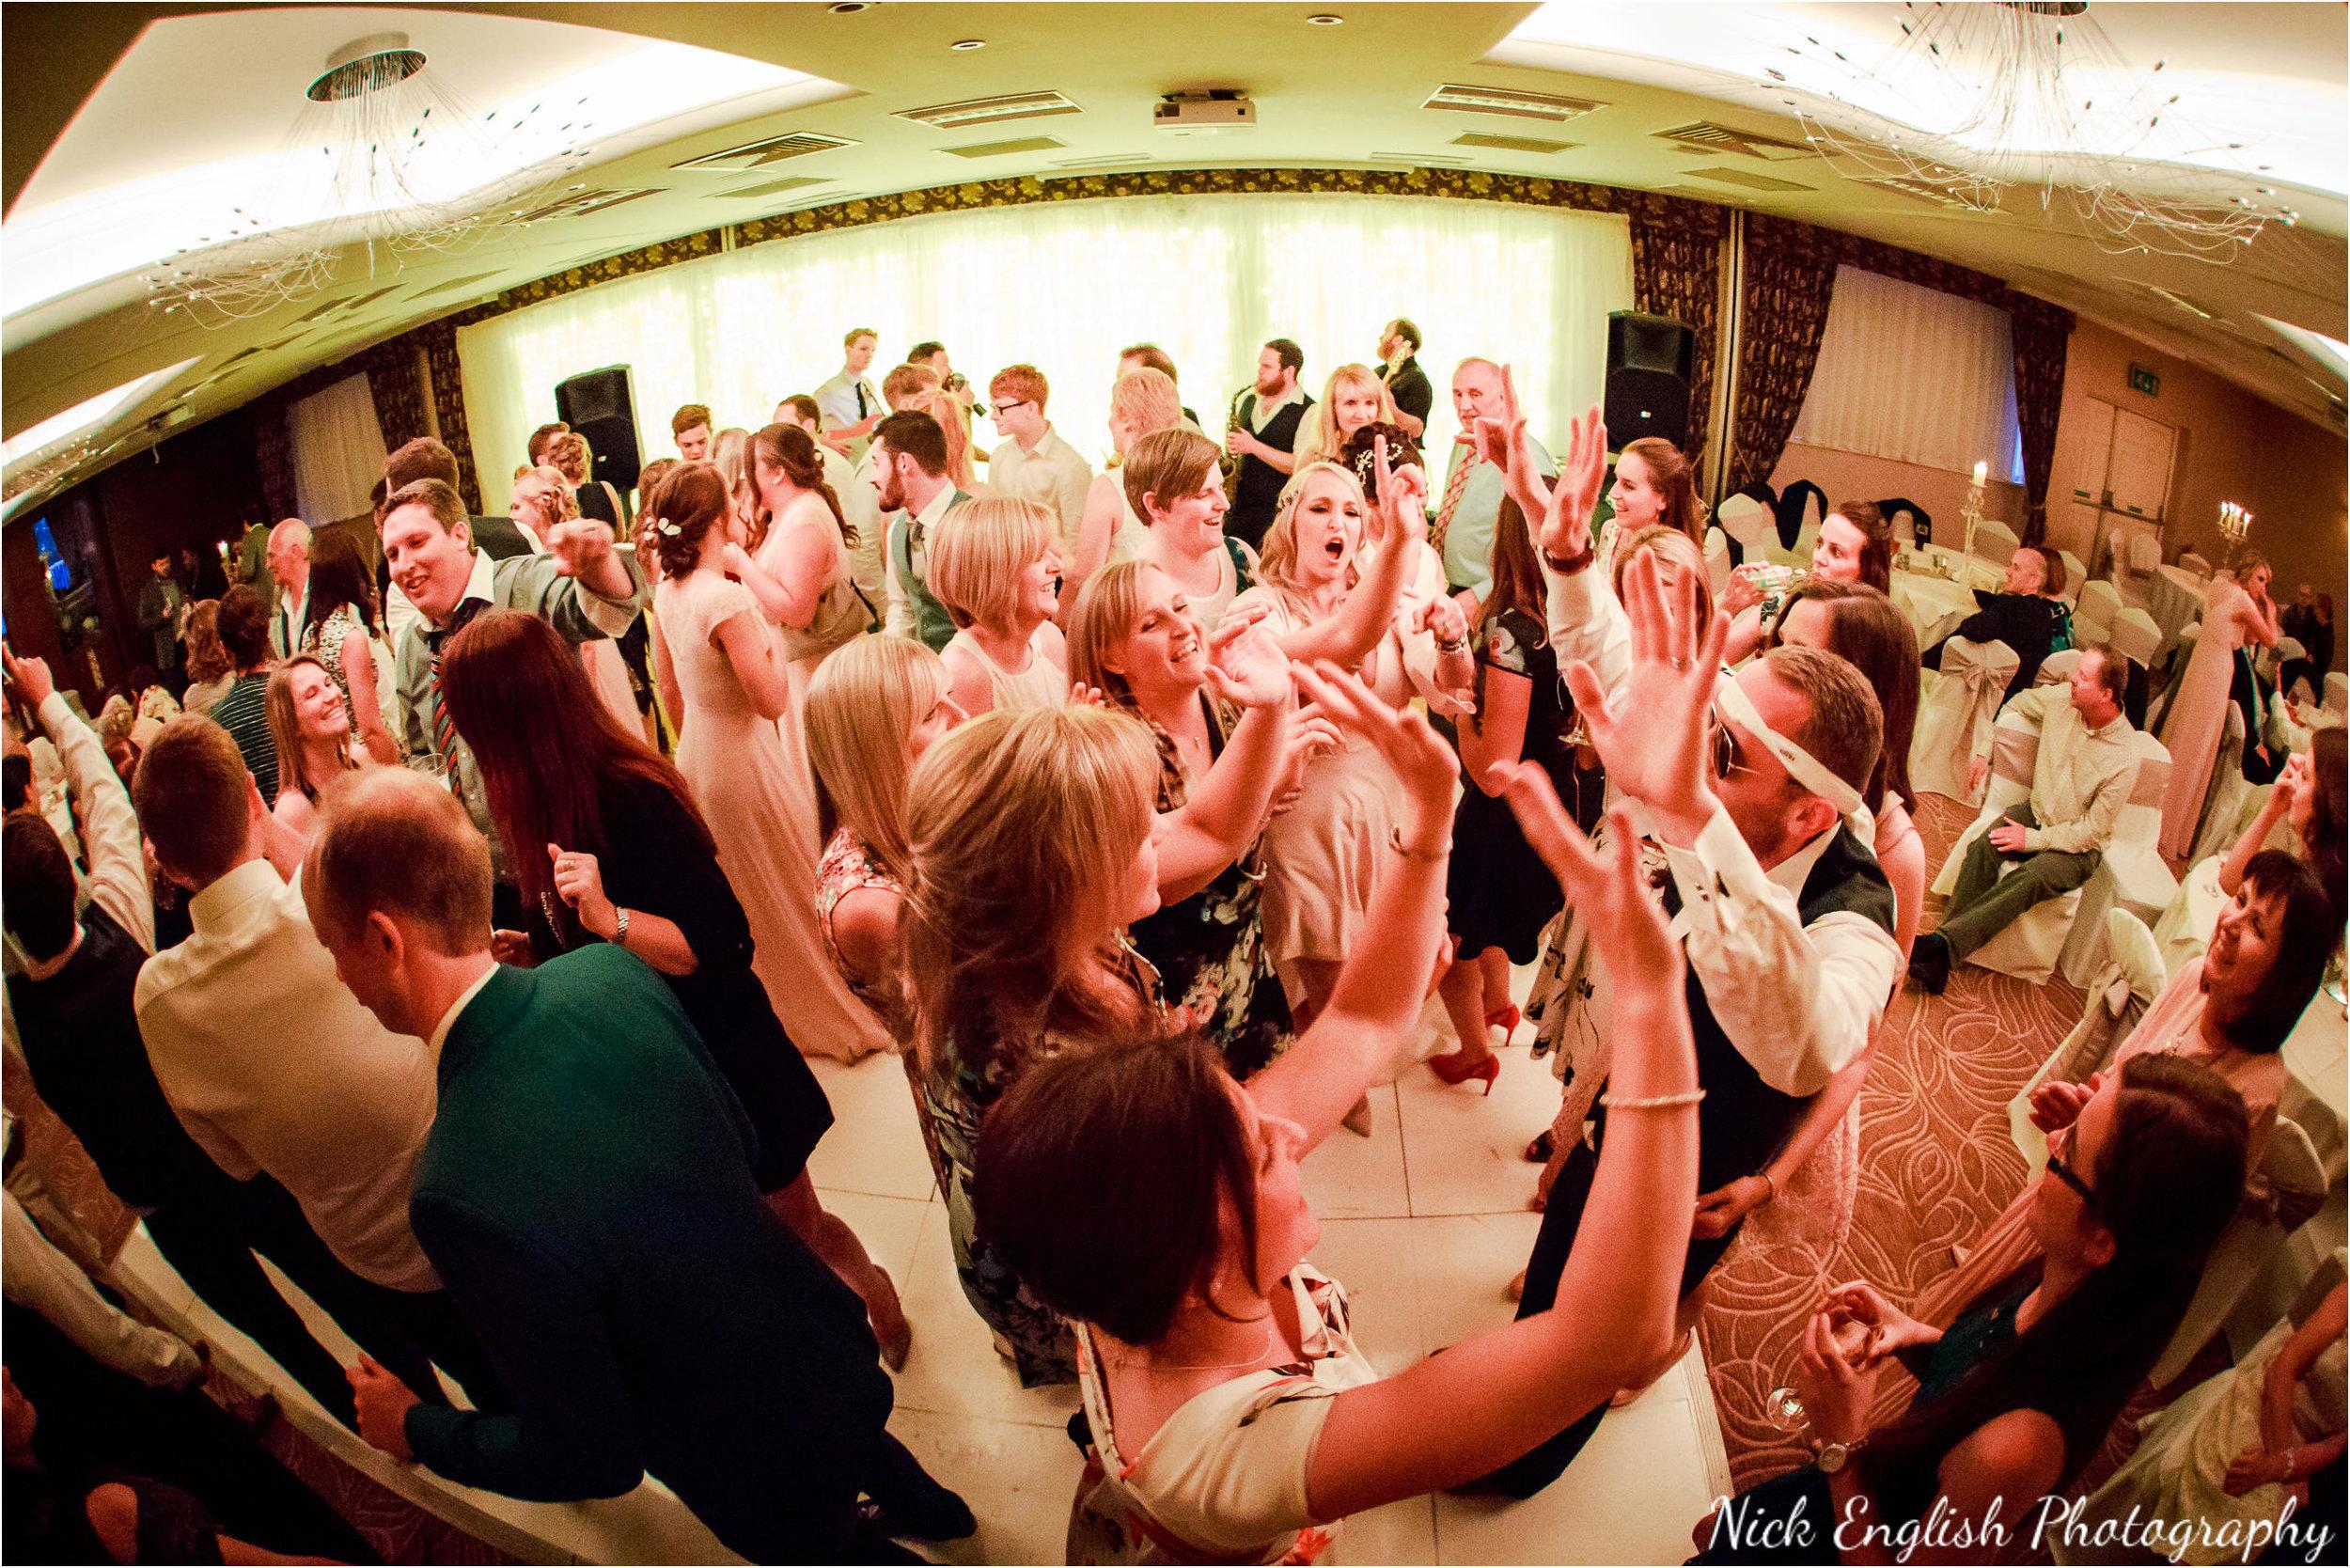 Emily David Wedding Photographs at Barton Grange Preston by Nick English Photography 234jpg.jpeg